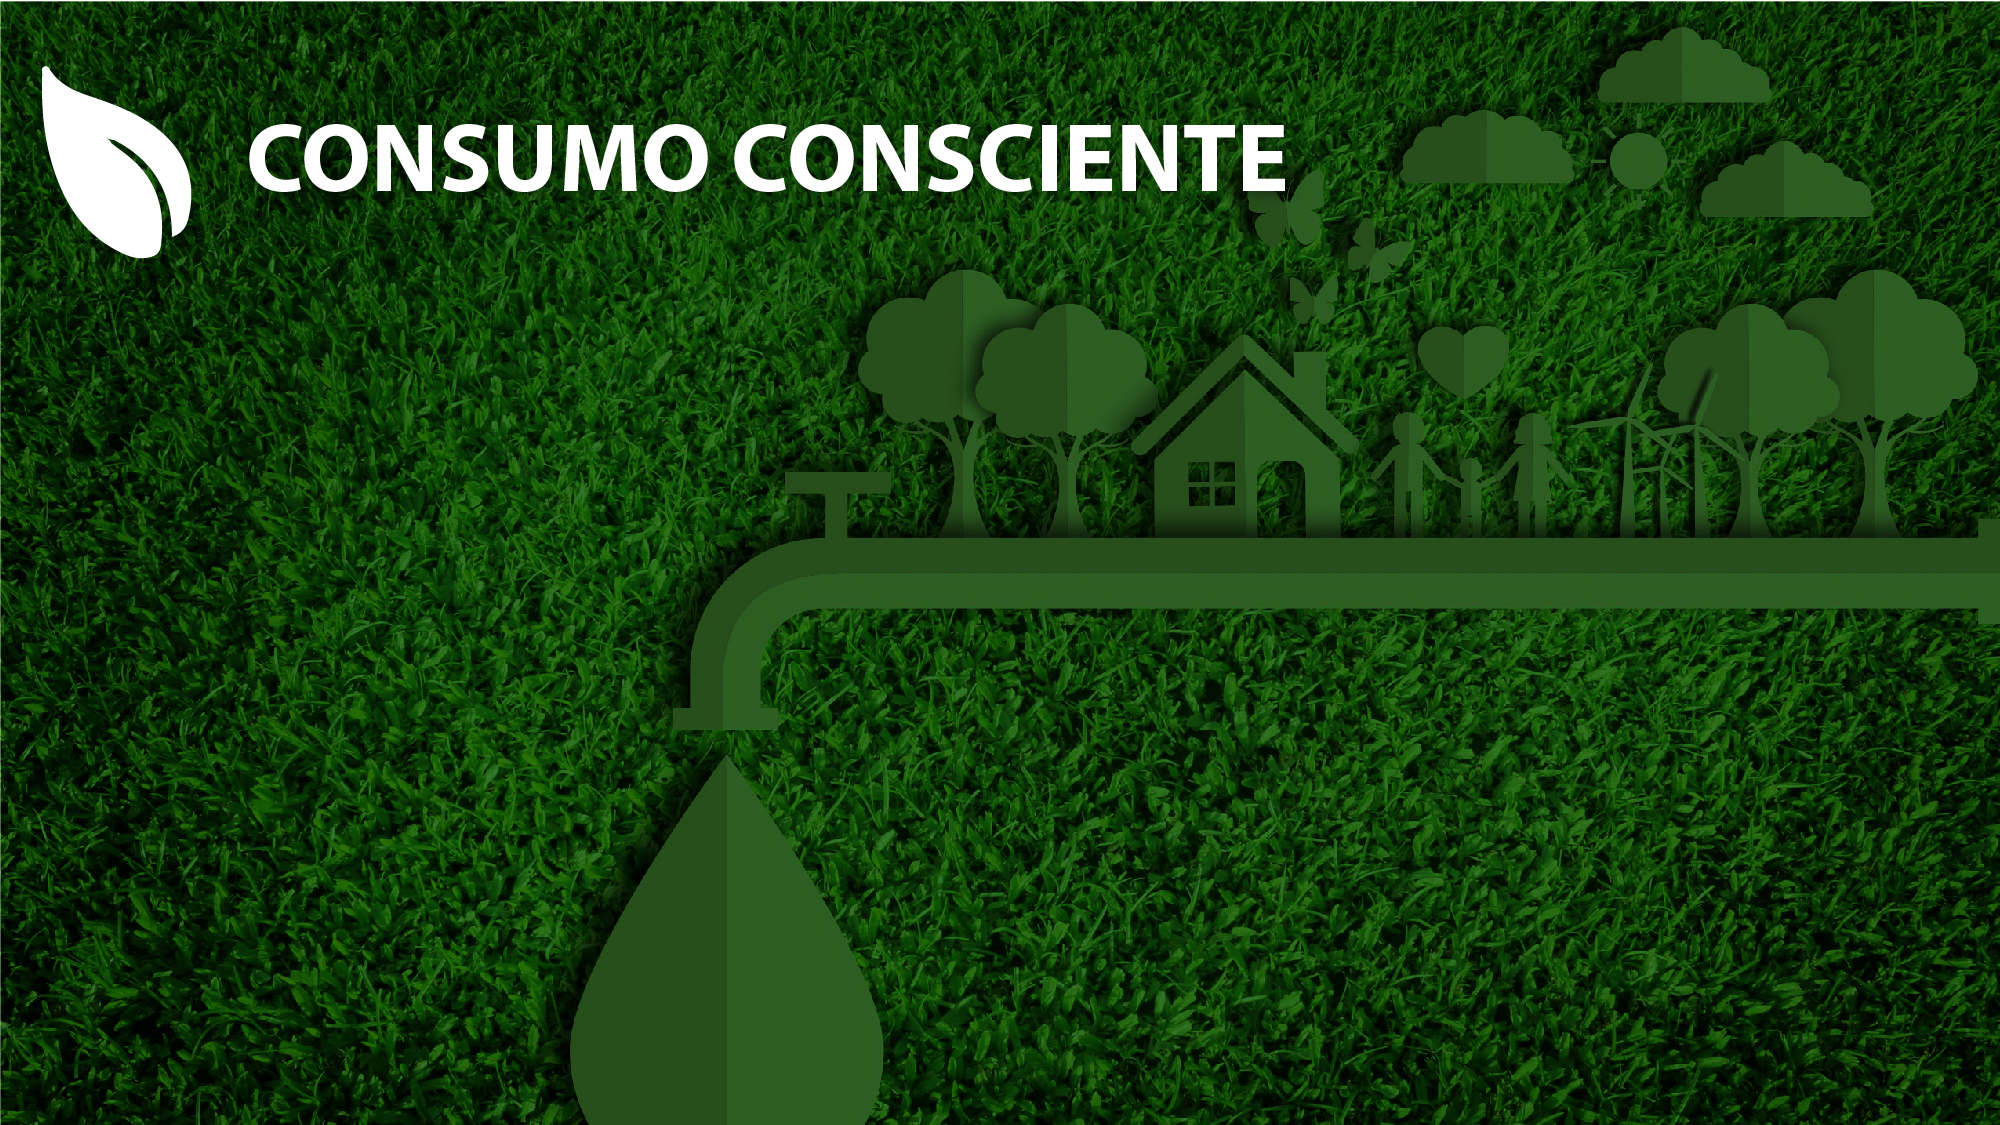 Consumo%20consciente 01